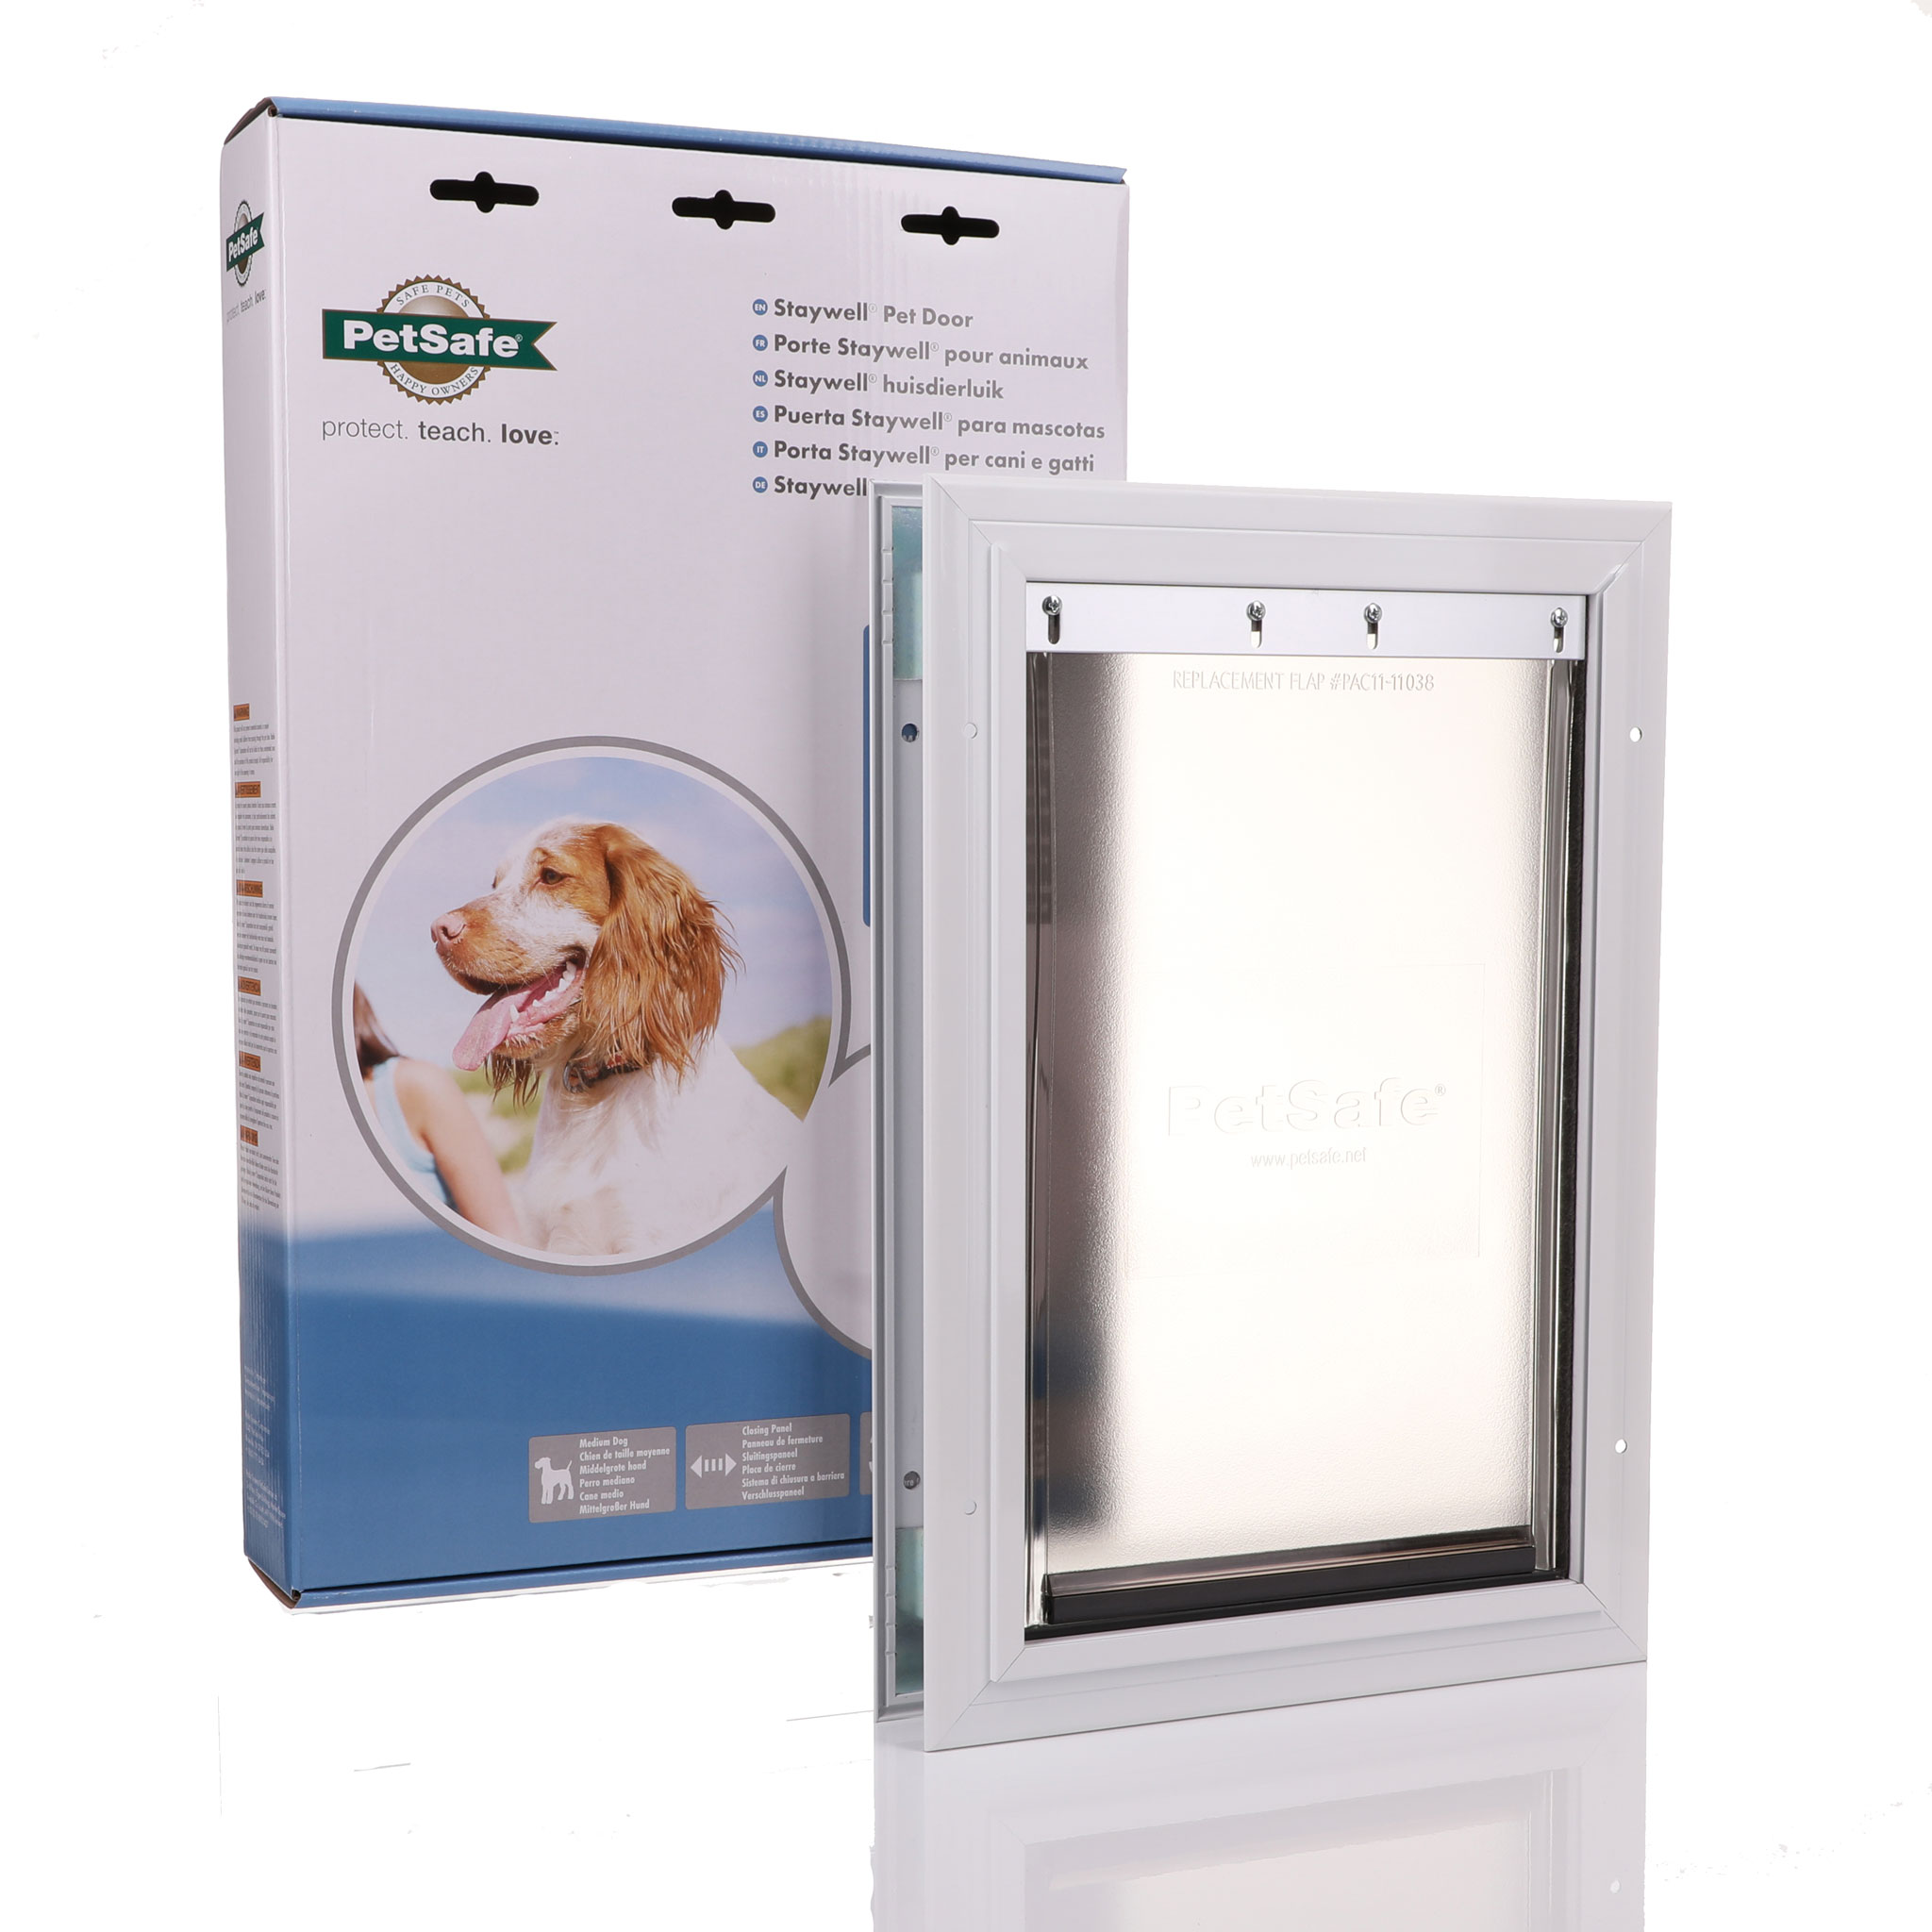 Aluminium framed dor flap with a flexible rubber door medium.